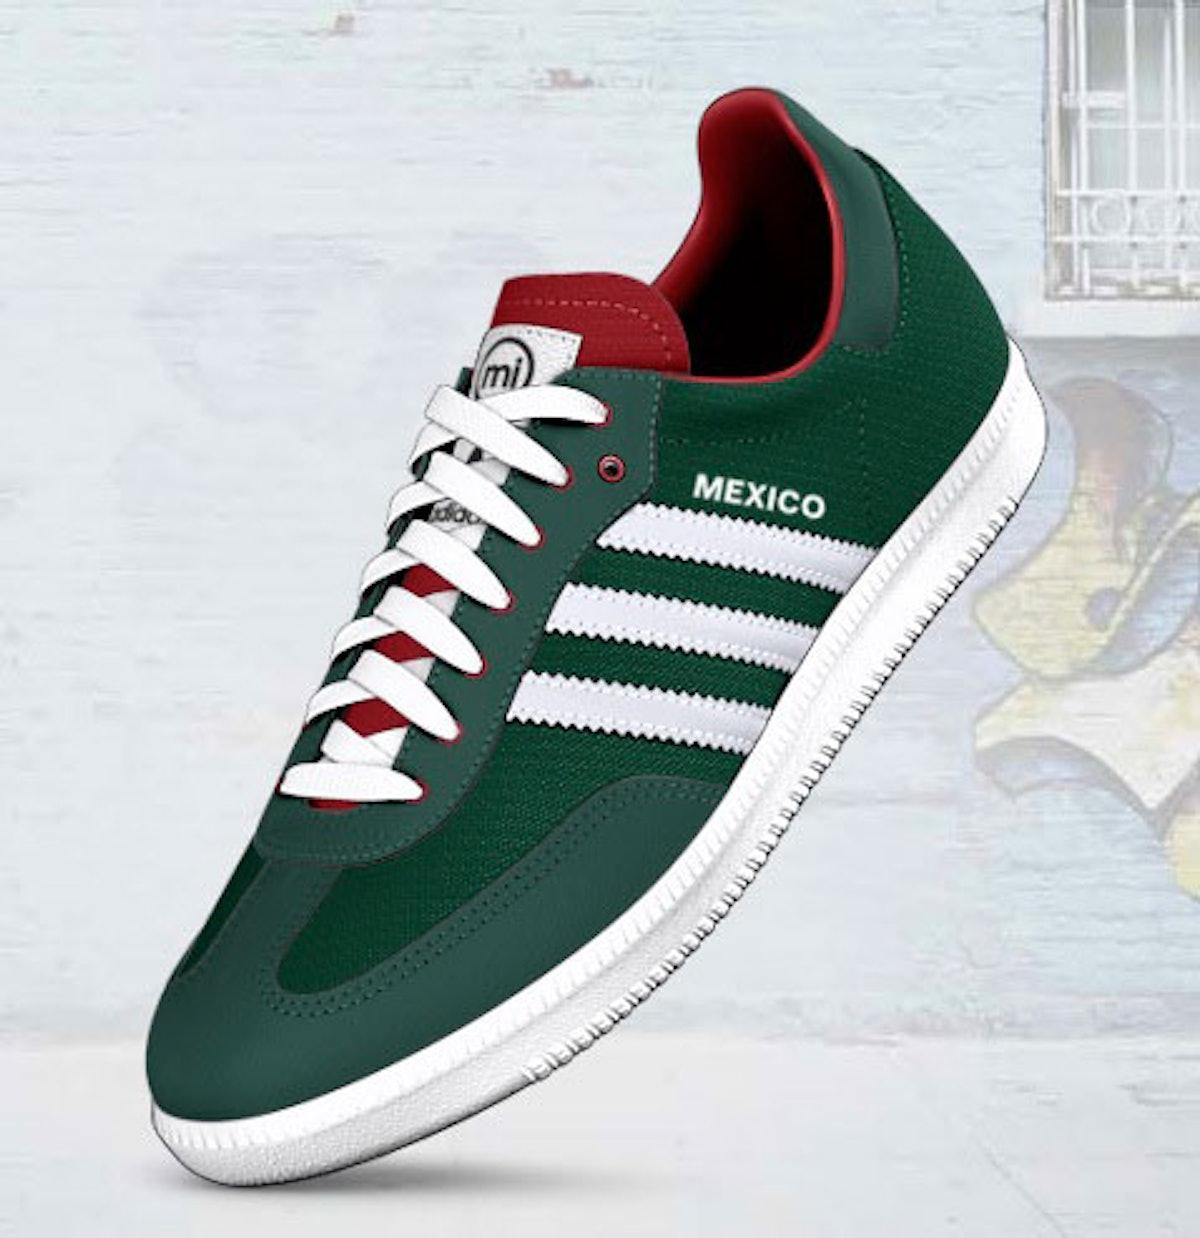 Adidas Team Mexico samba shoe